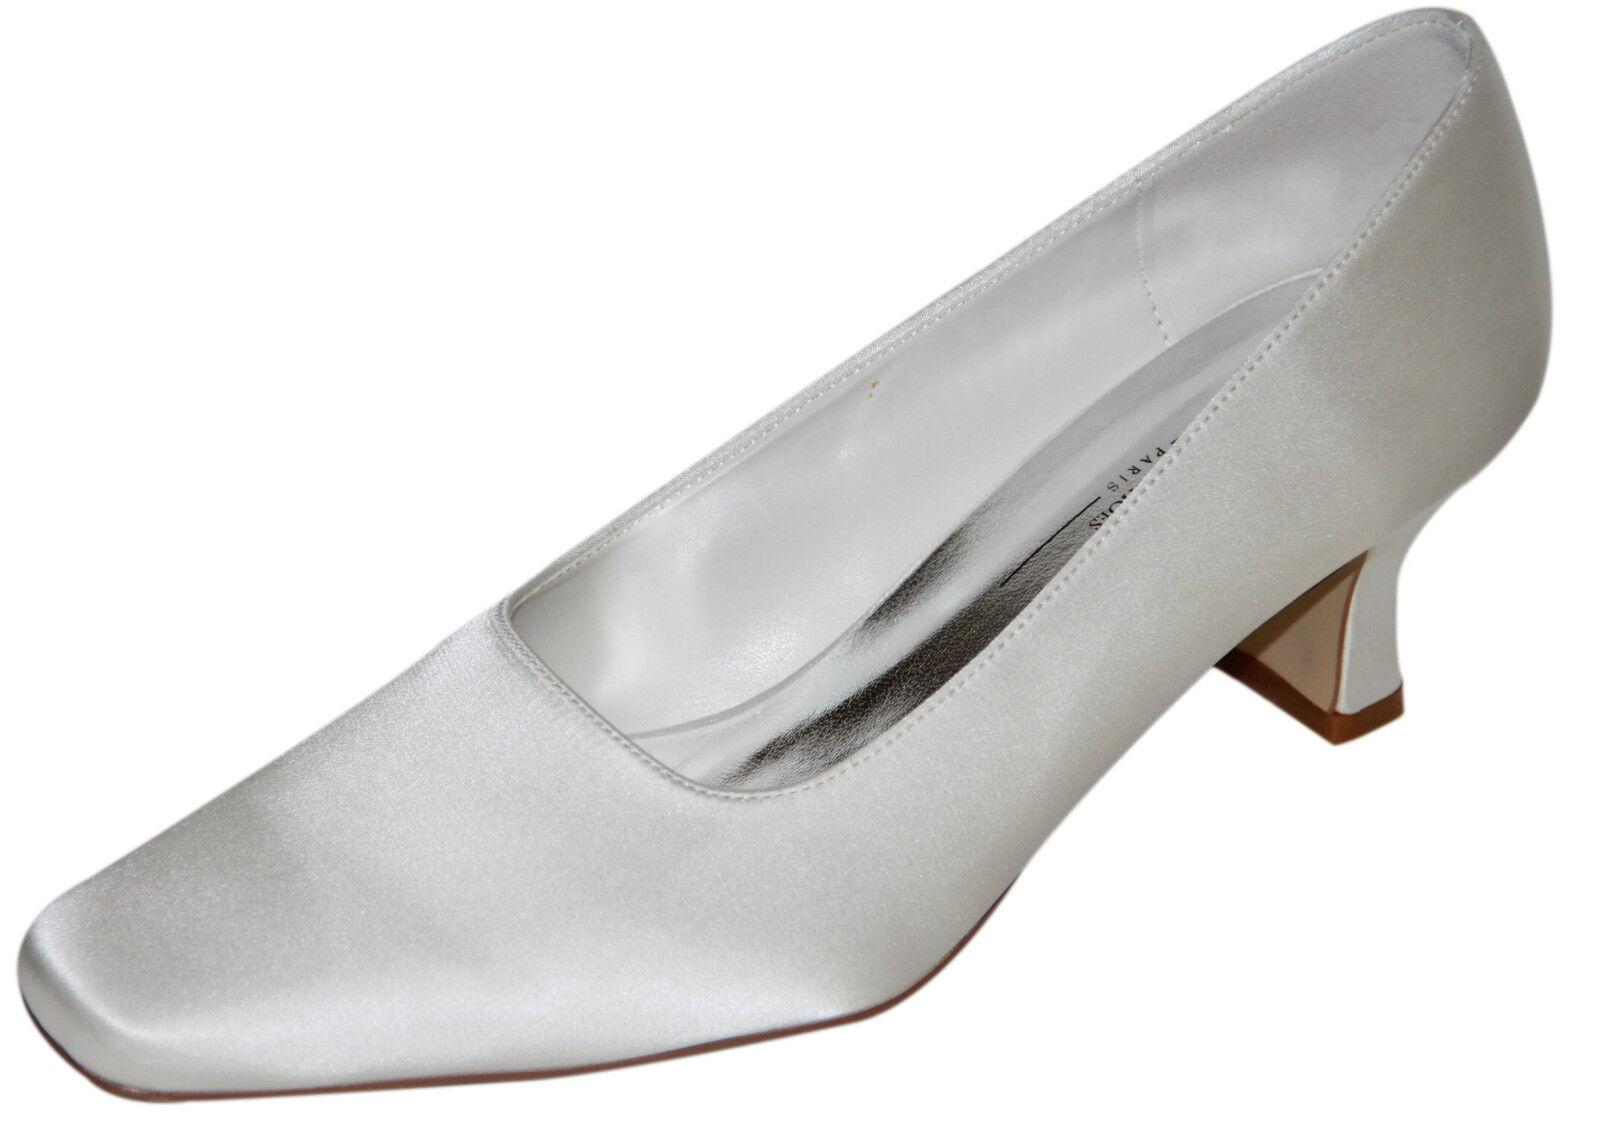 HBH Bridal Shoes Classic Bridal Pumps Satin, without buckle, 5cm Block Heel